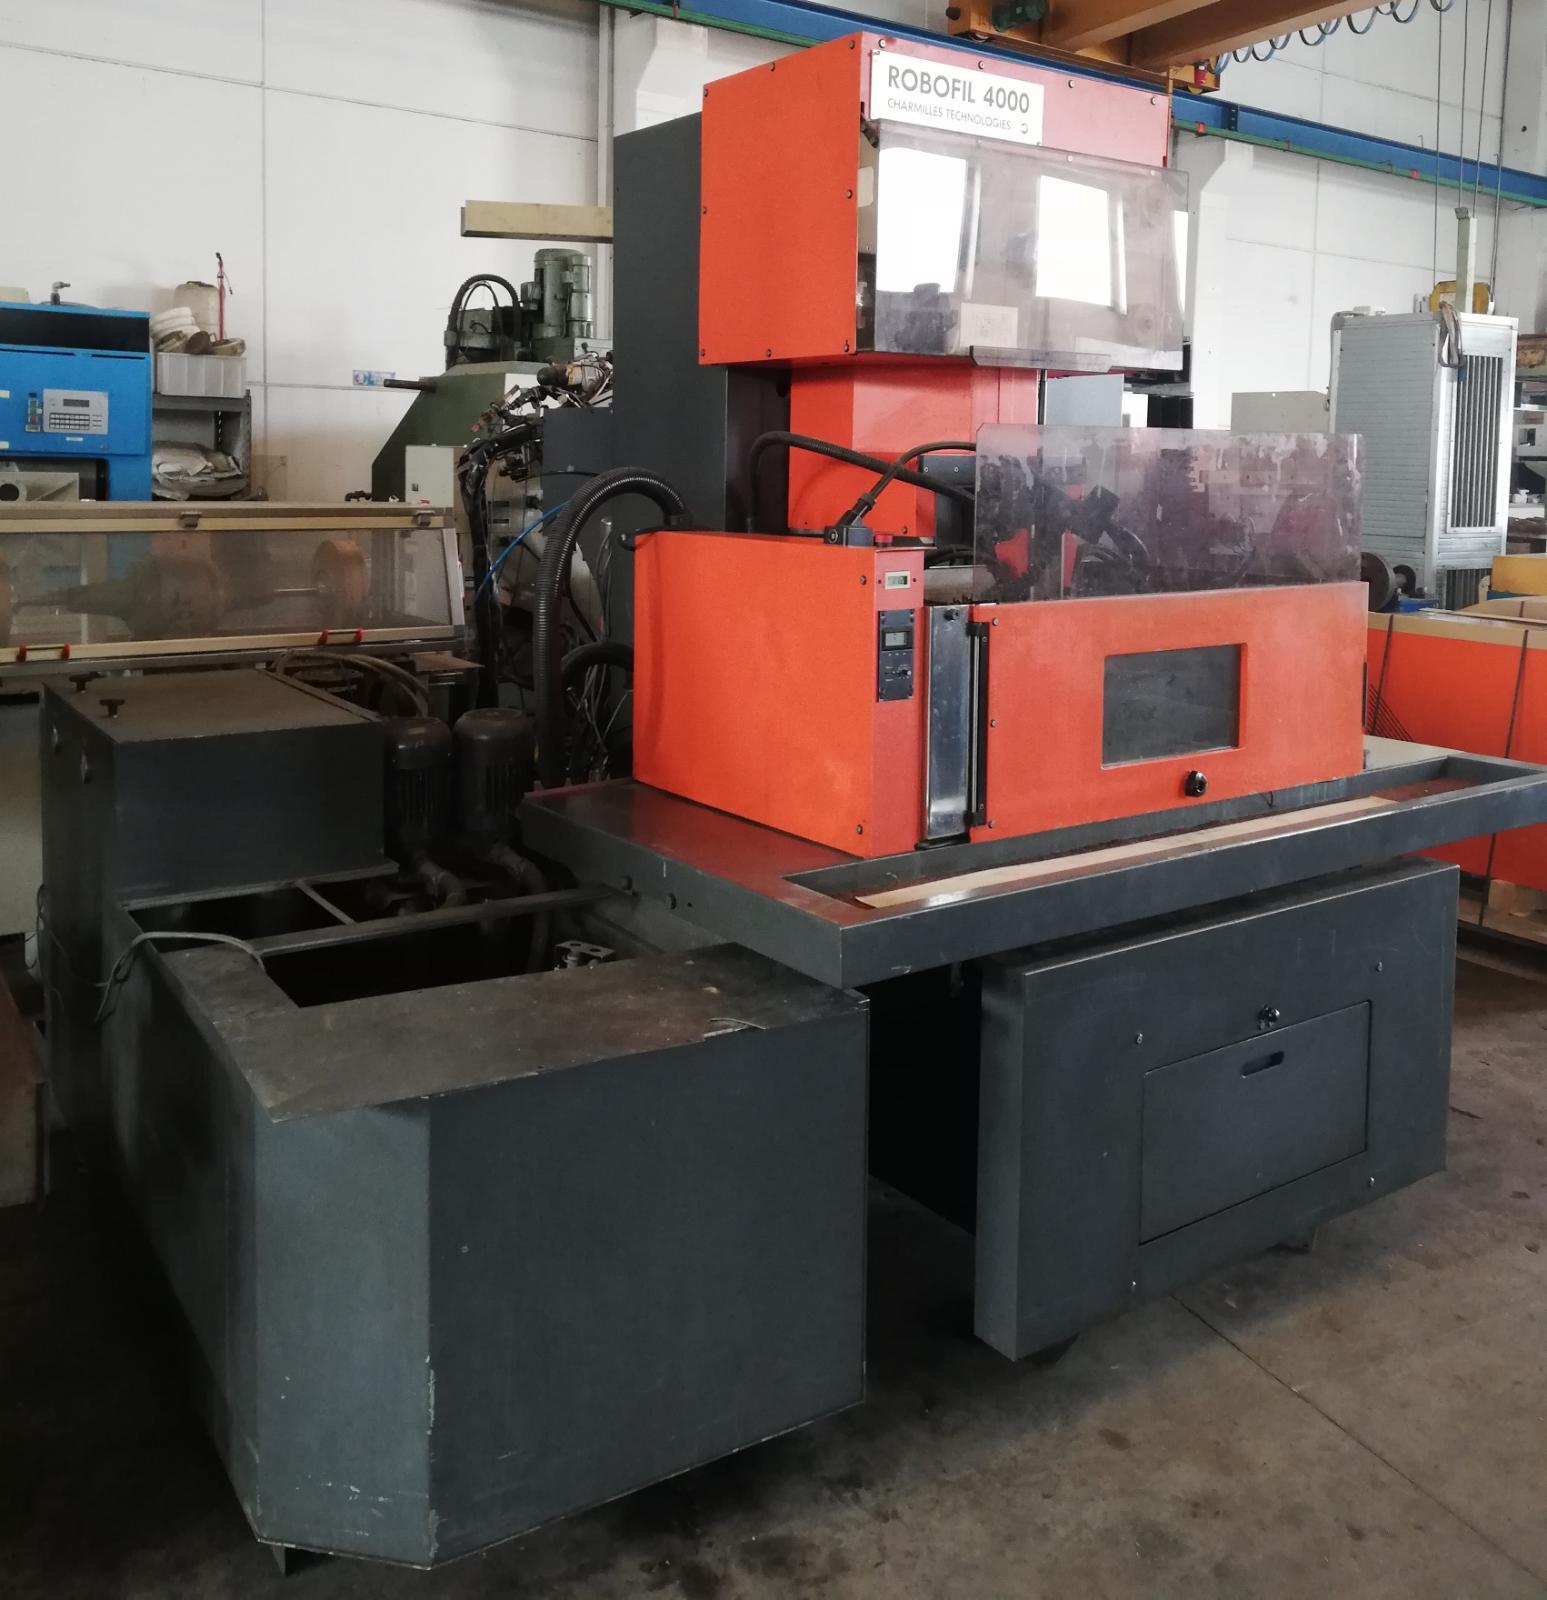 Electroerosion ROBOFIL 4000